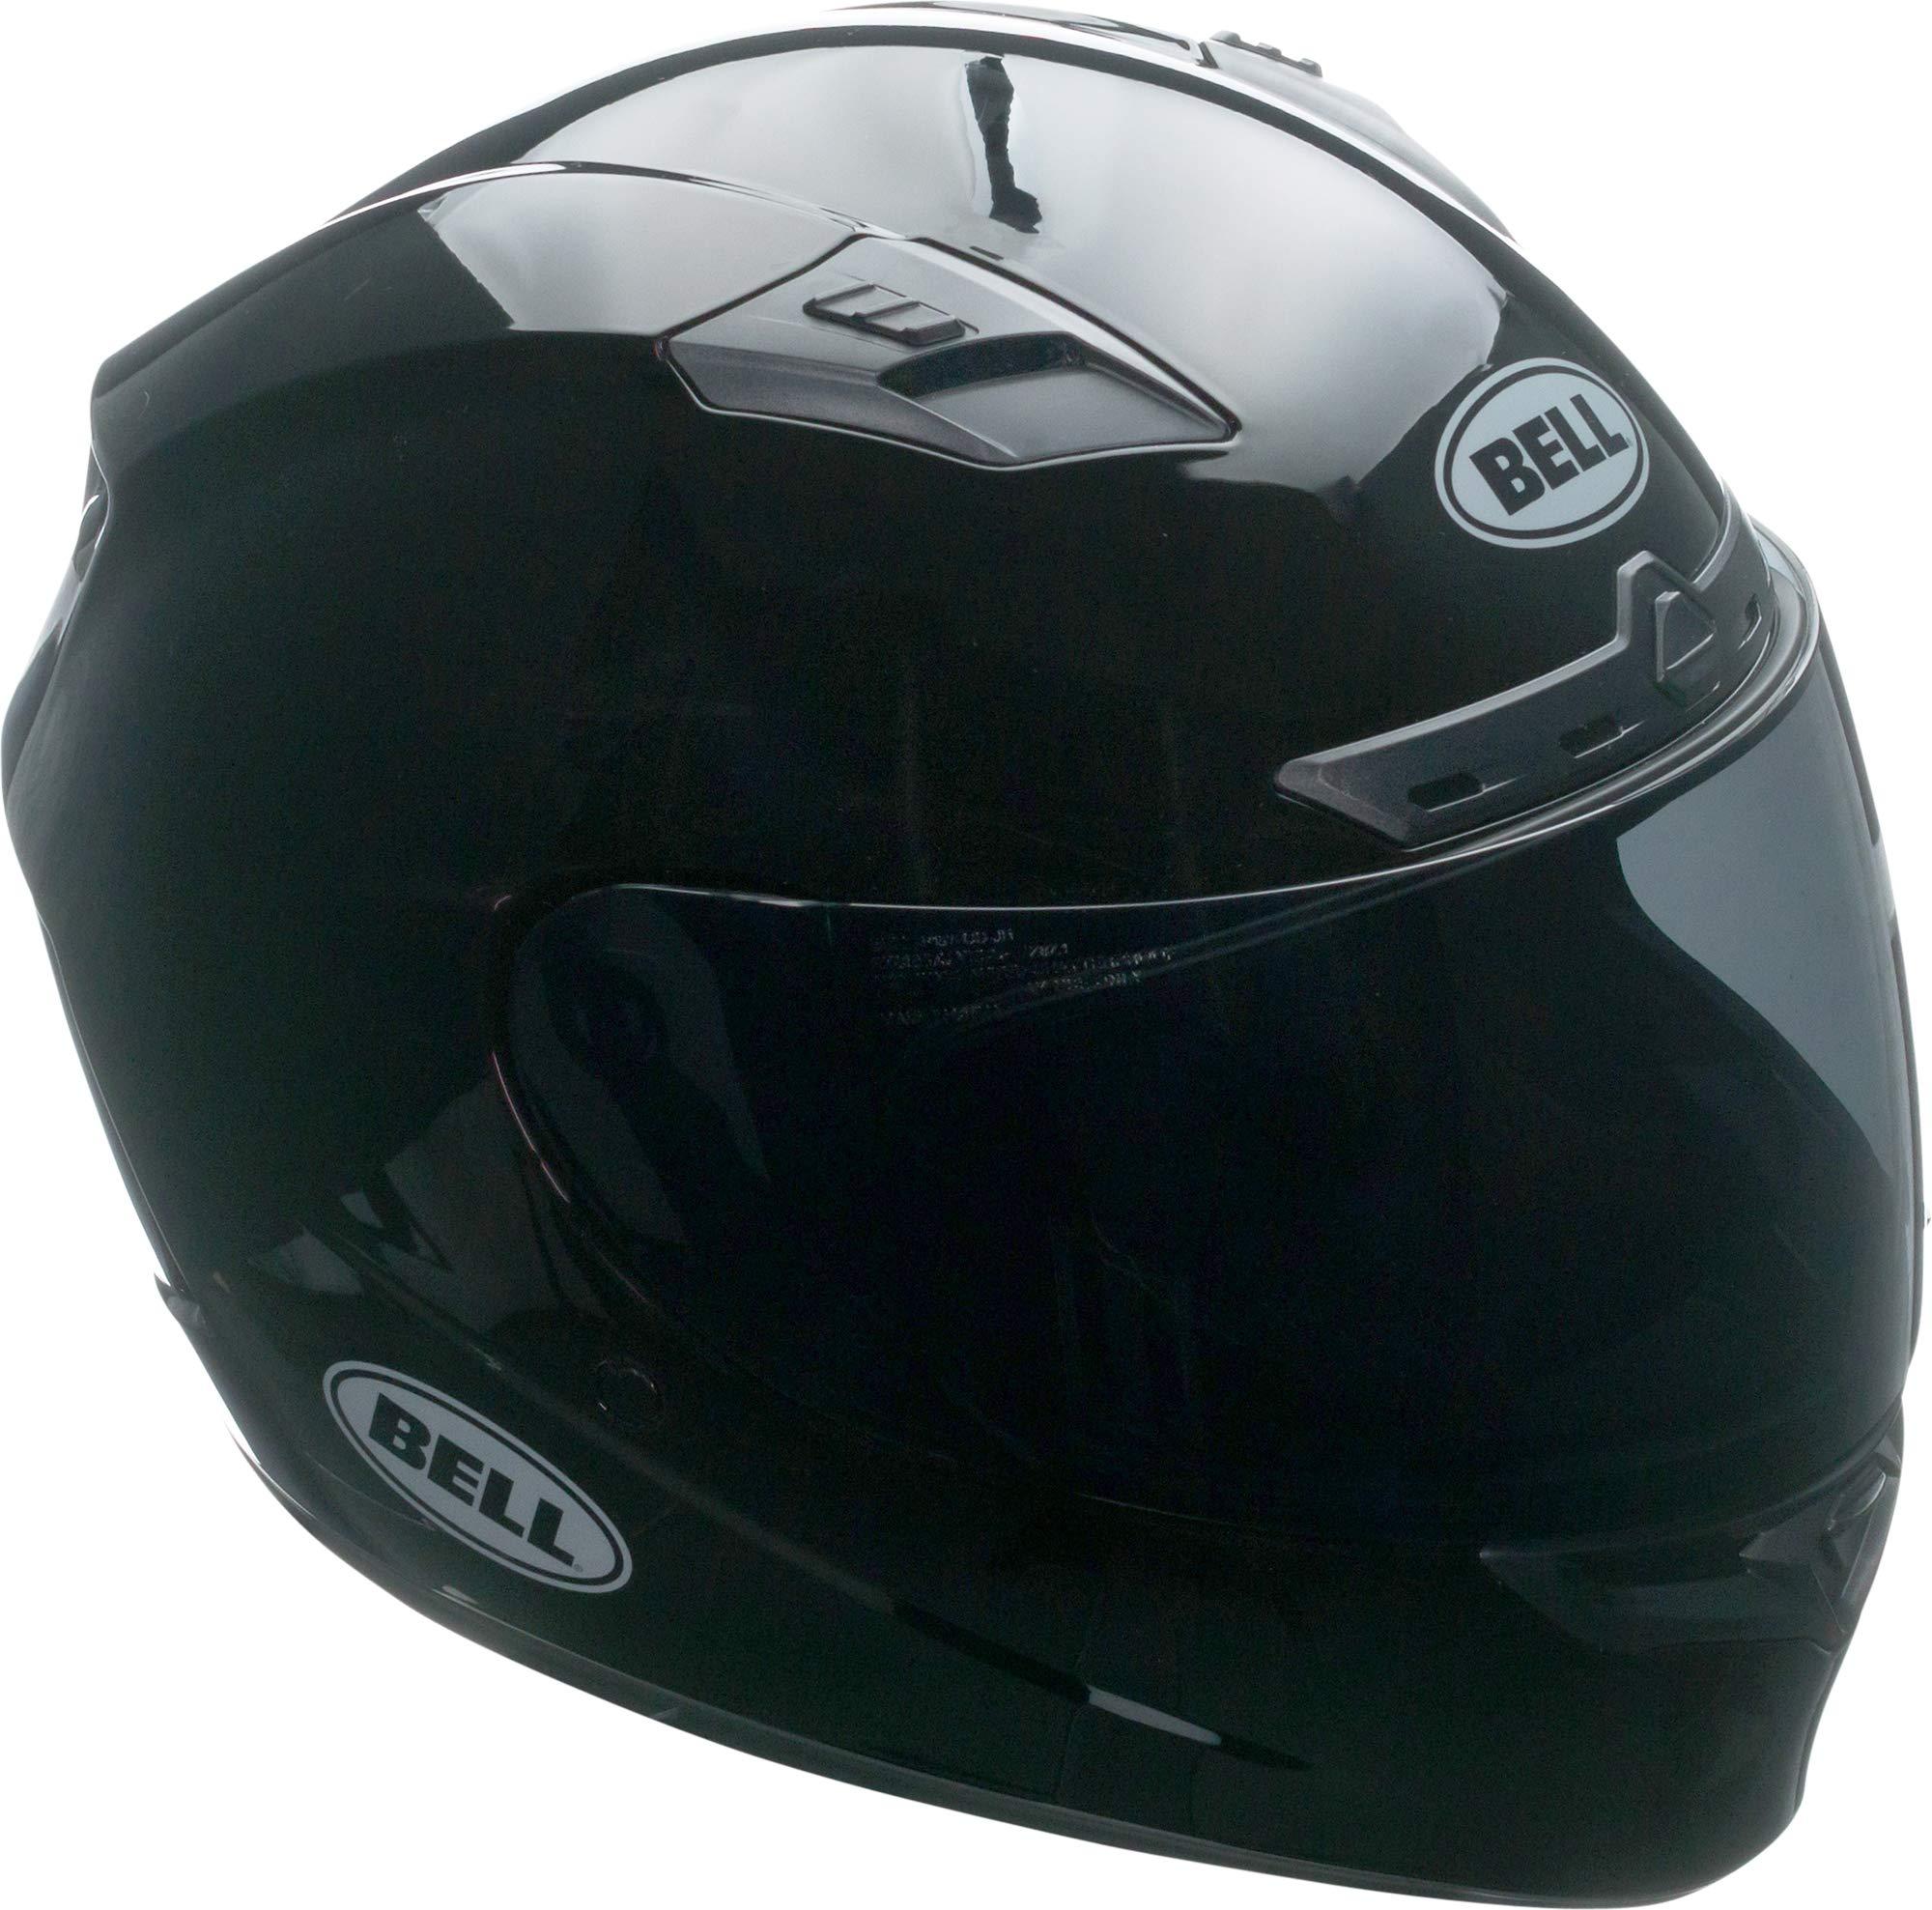 Bell Qualifier DLX MIPS Full-Face Motorcycle Helmet (Solid Black, Medium)